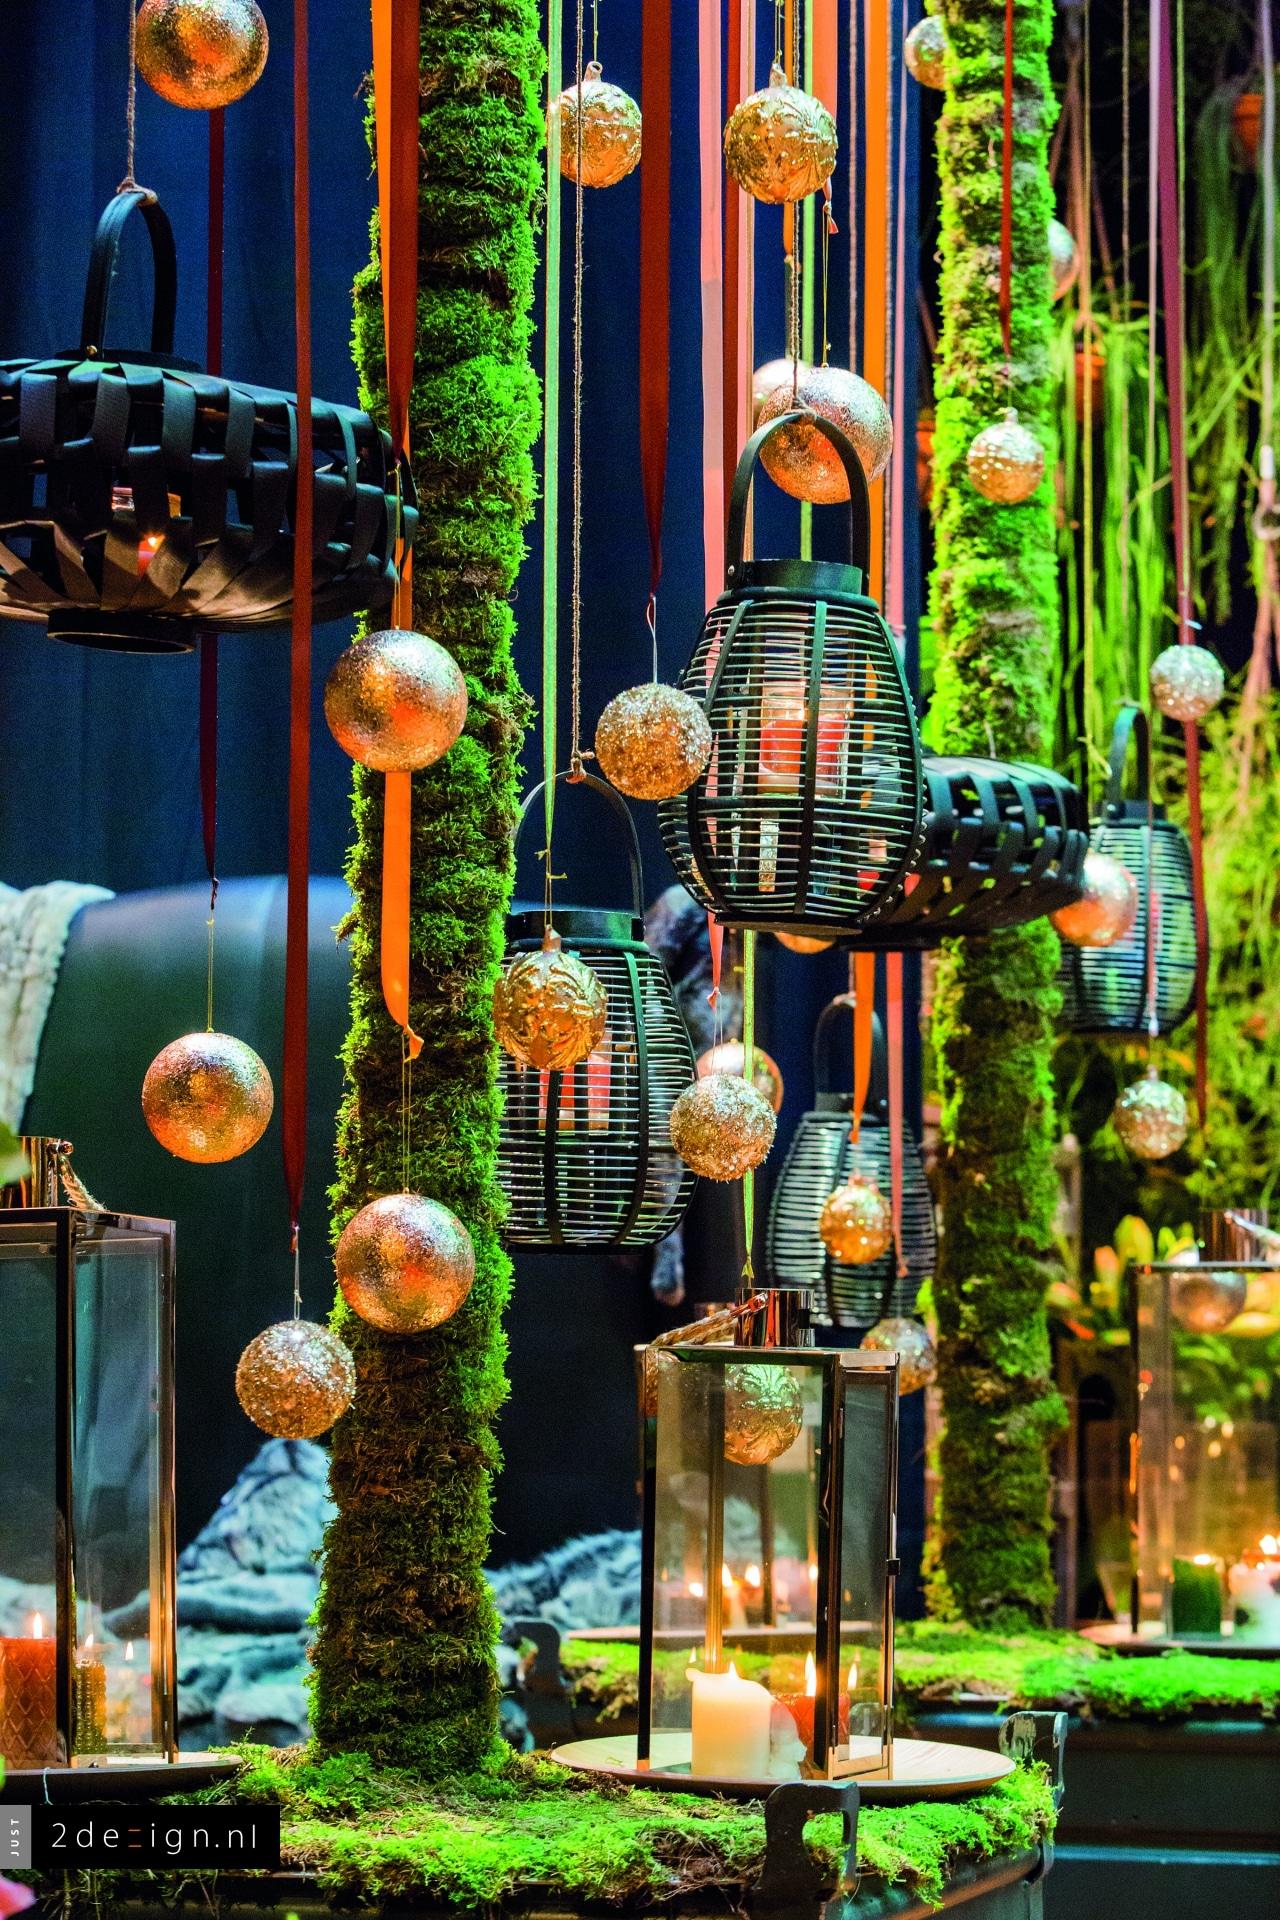 Christmasworld - Design by modern nature(7)